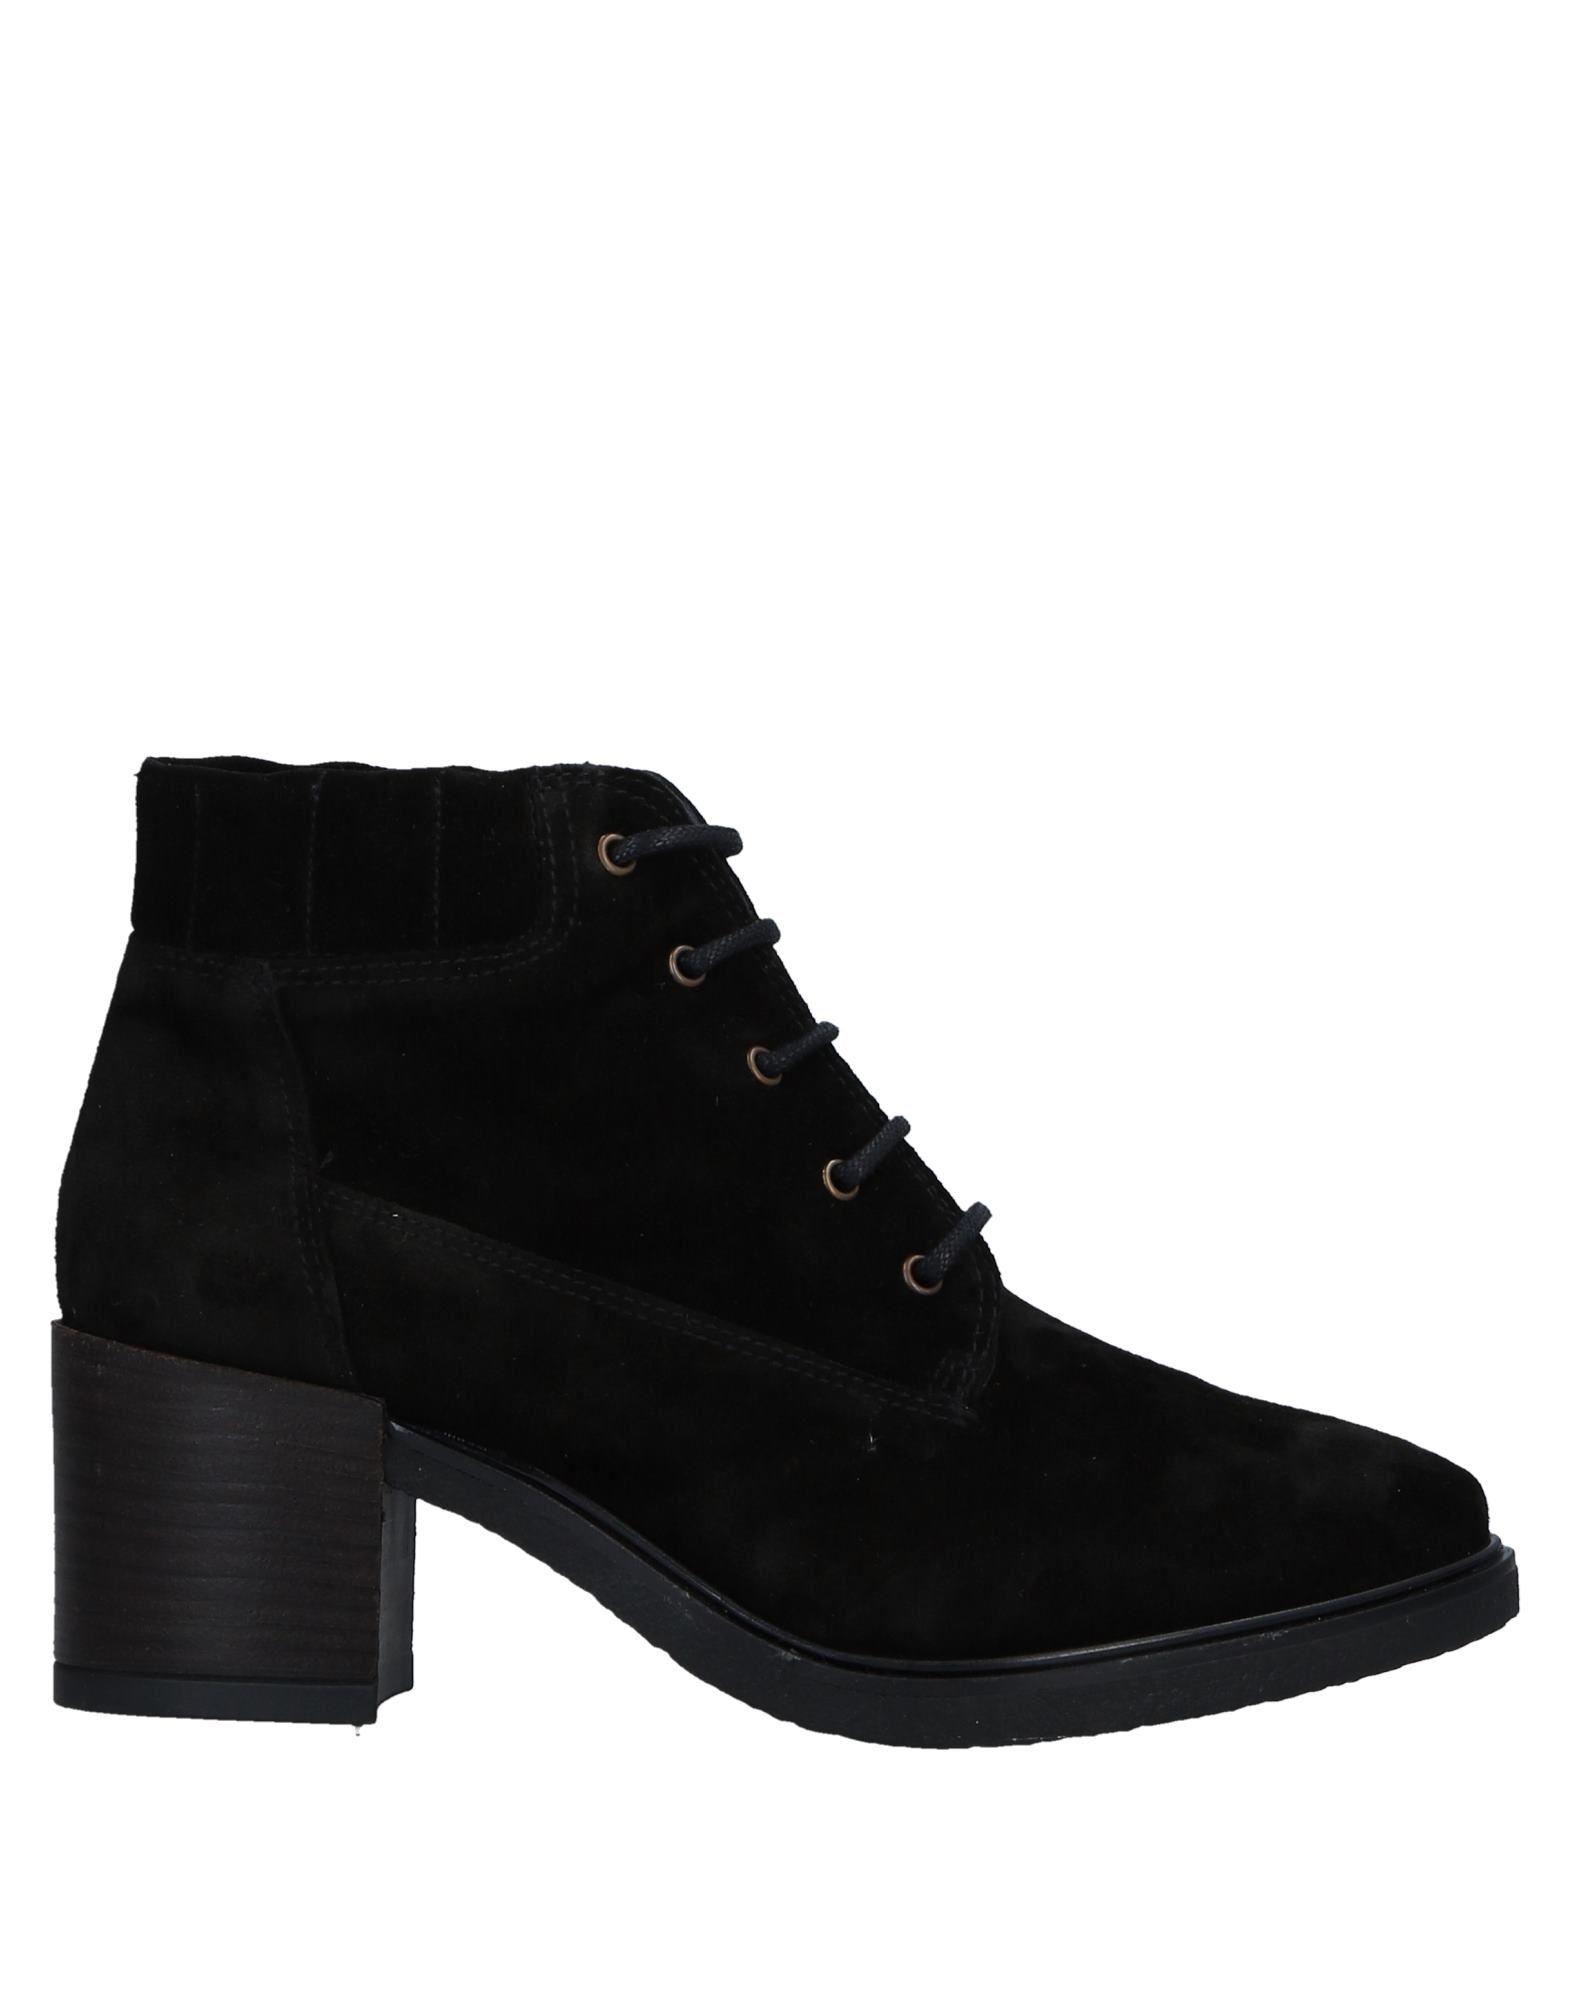 Bottine Gaimo Femme - Bottines Gaimo Beige Chaussures femme pas cher homme et femme